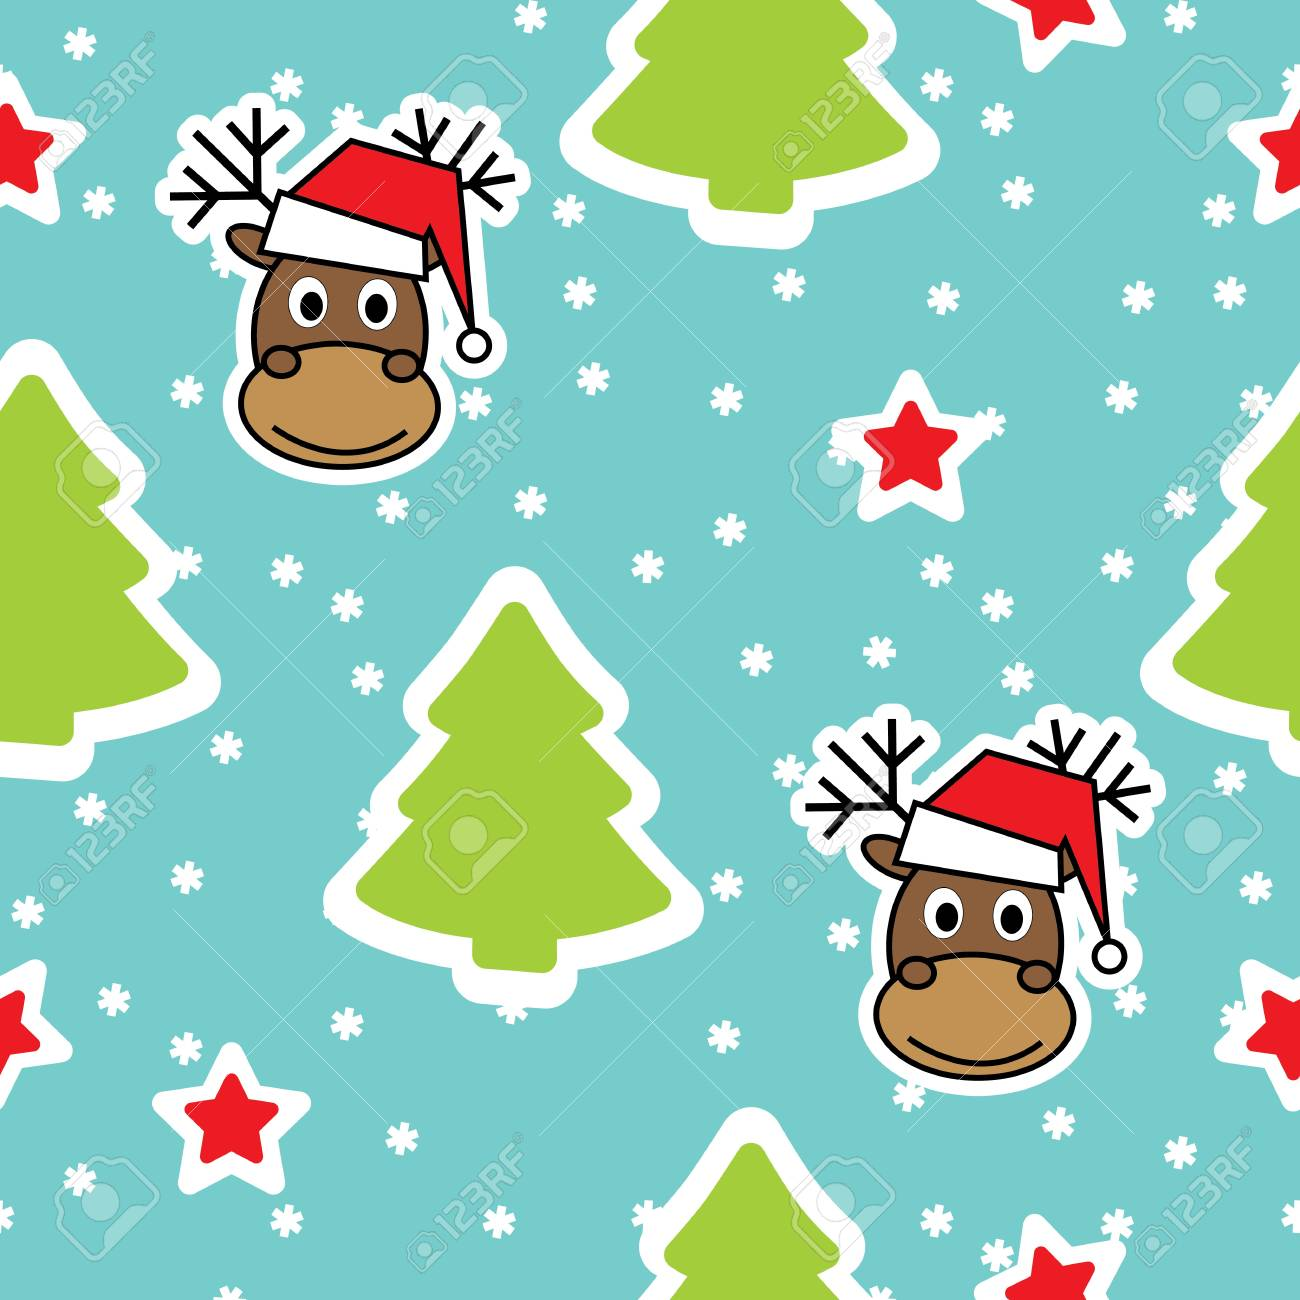 Seamless winter pattern, Christmas Stock Vector - 16449877